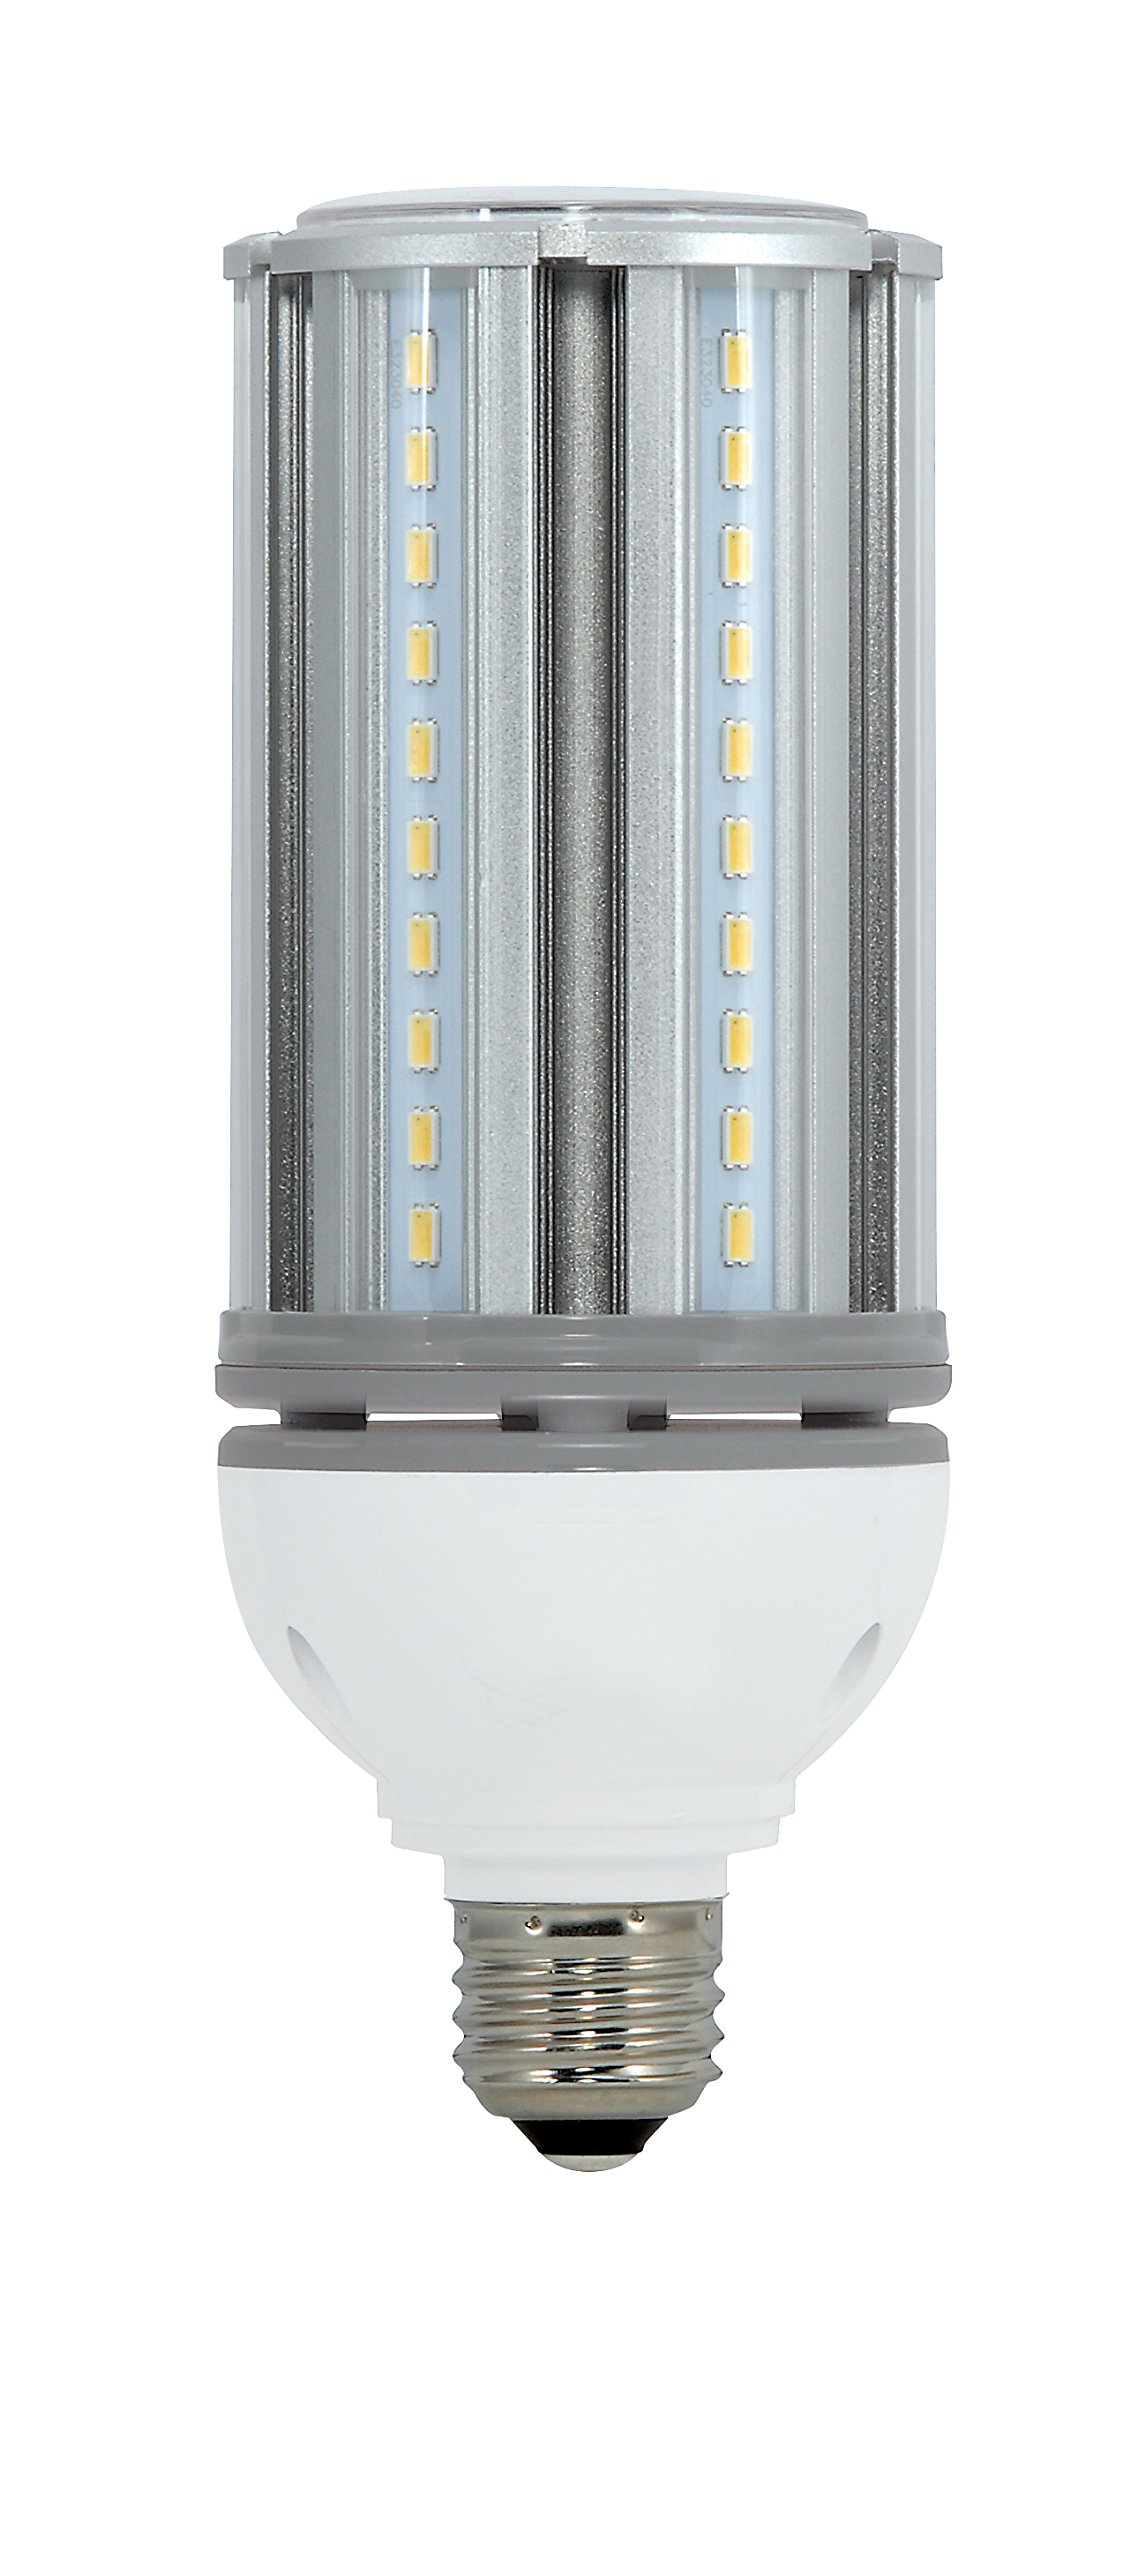 (6-Pack) Satco S9391 - 22W/LED/HID/5000K/100-277V 22W 5000K E26 Base 100W HID Replacement LED Light Bulb